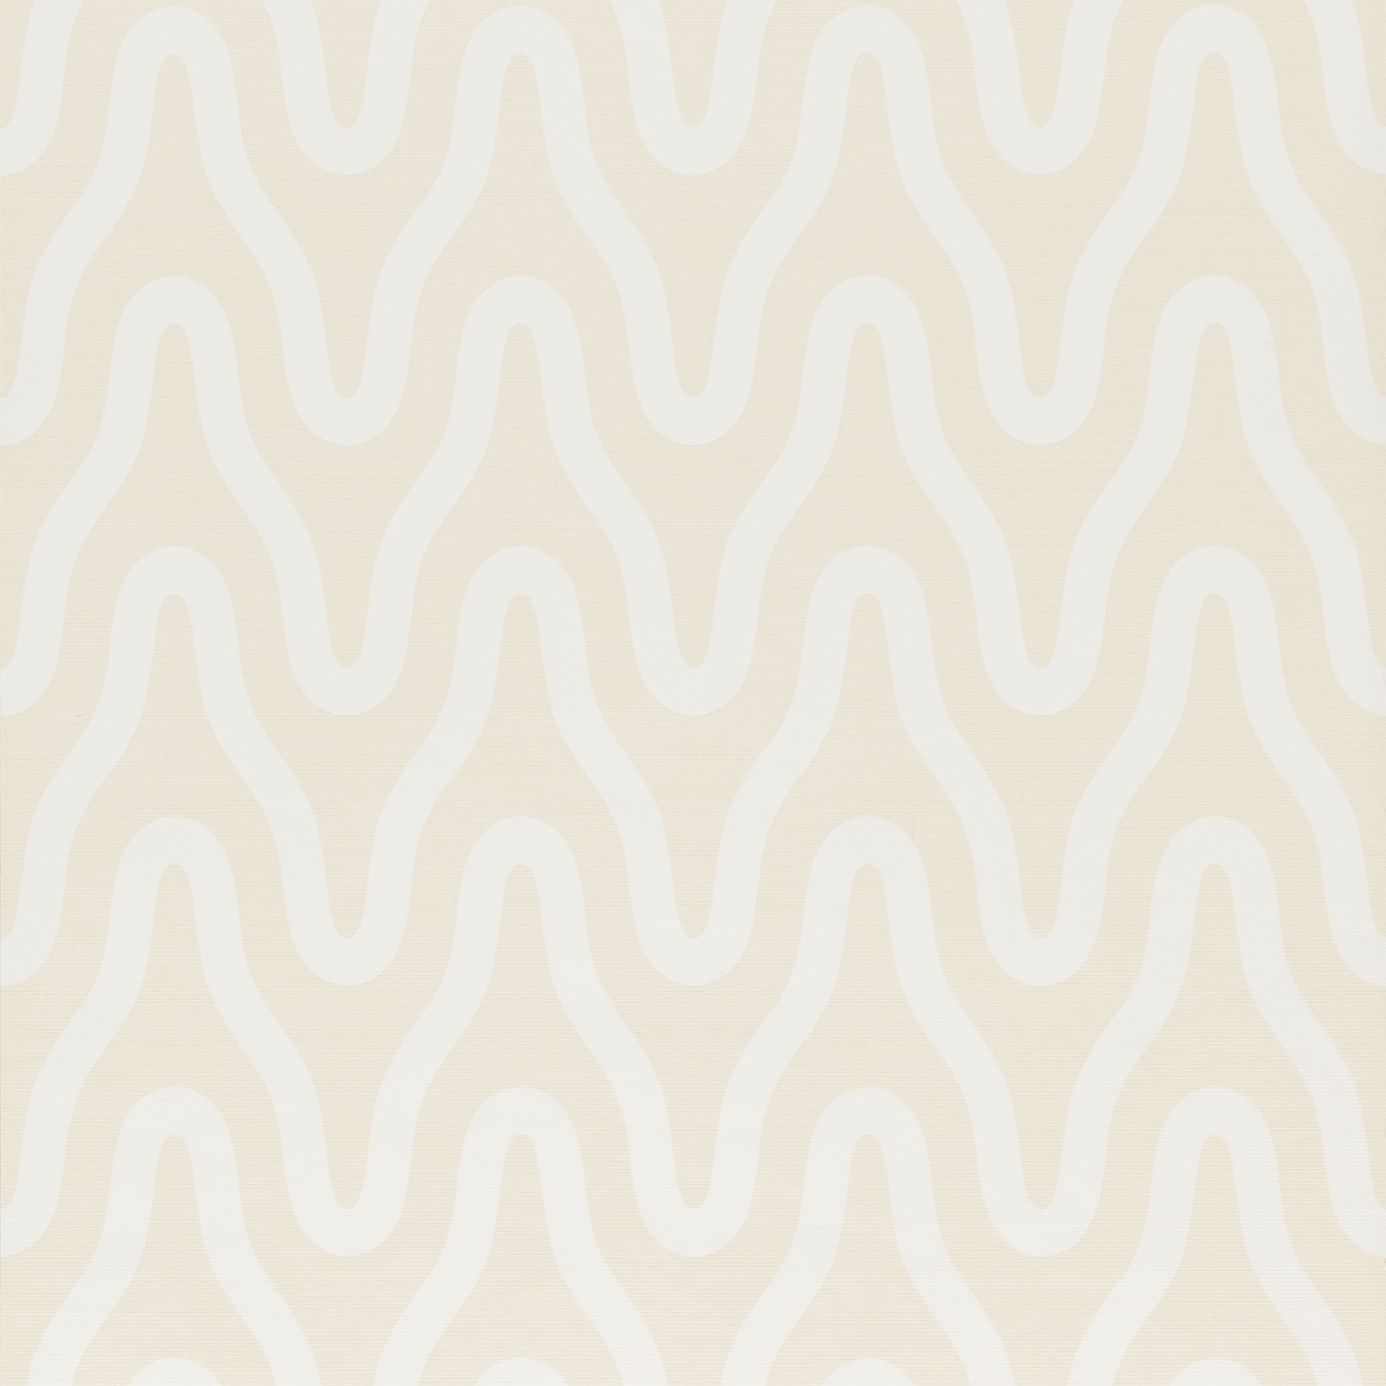 Modern Geometric Wallpaper Hd Collection arkona wallpaper 1386x1386